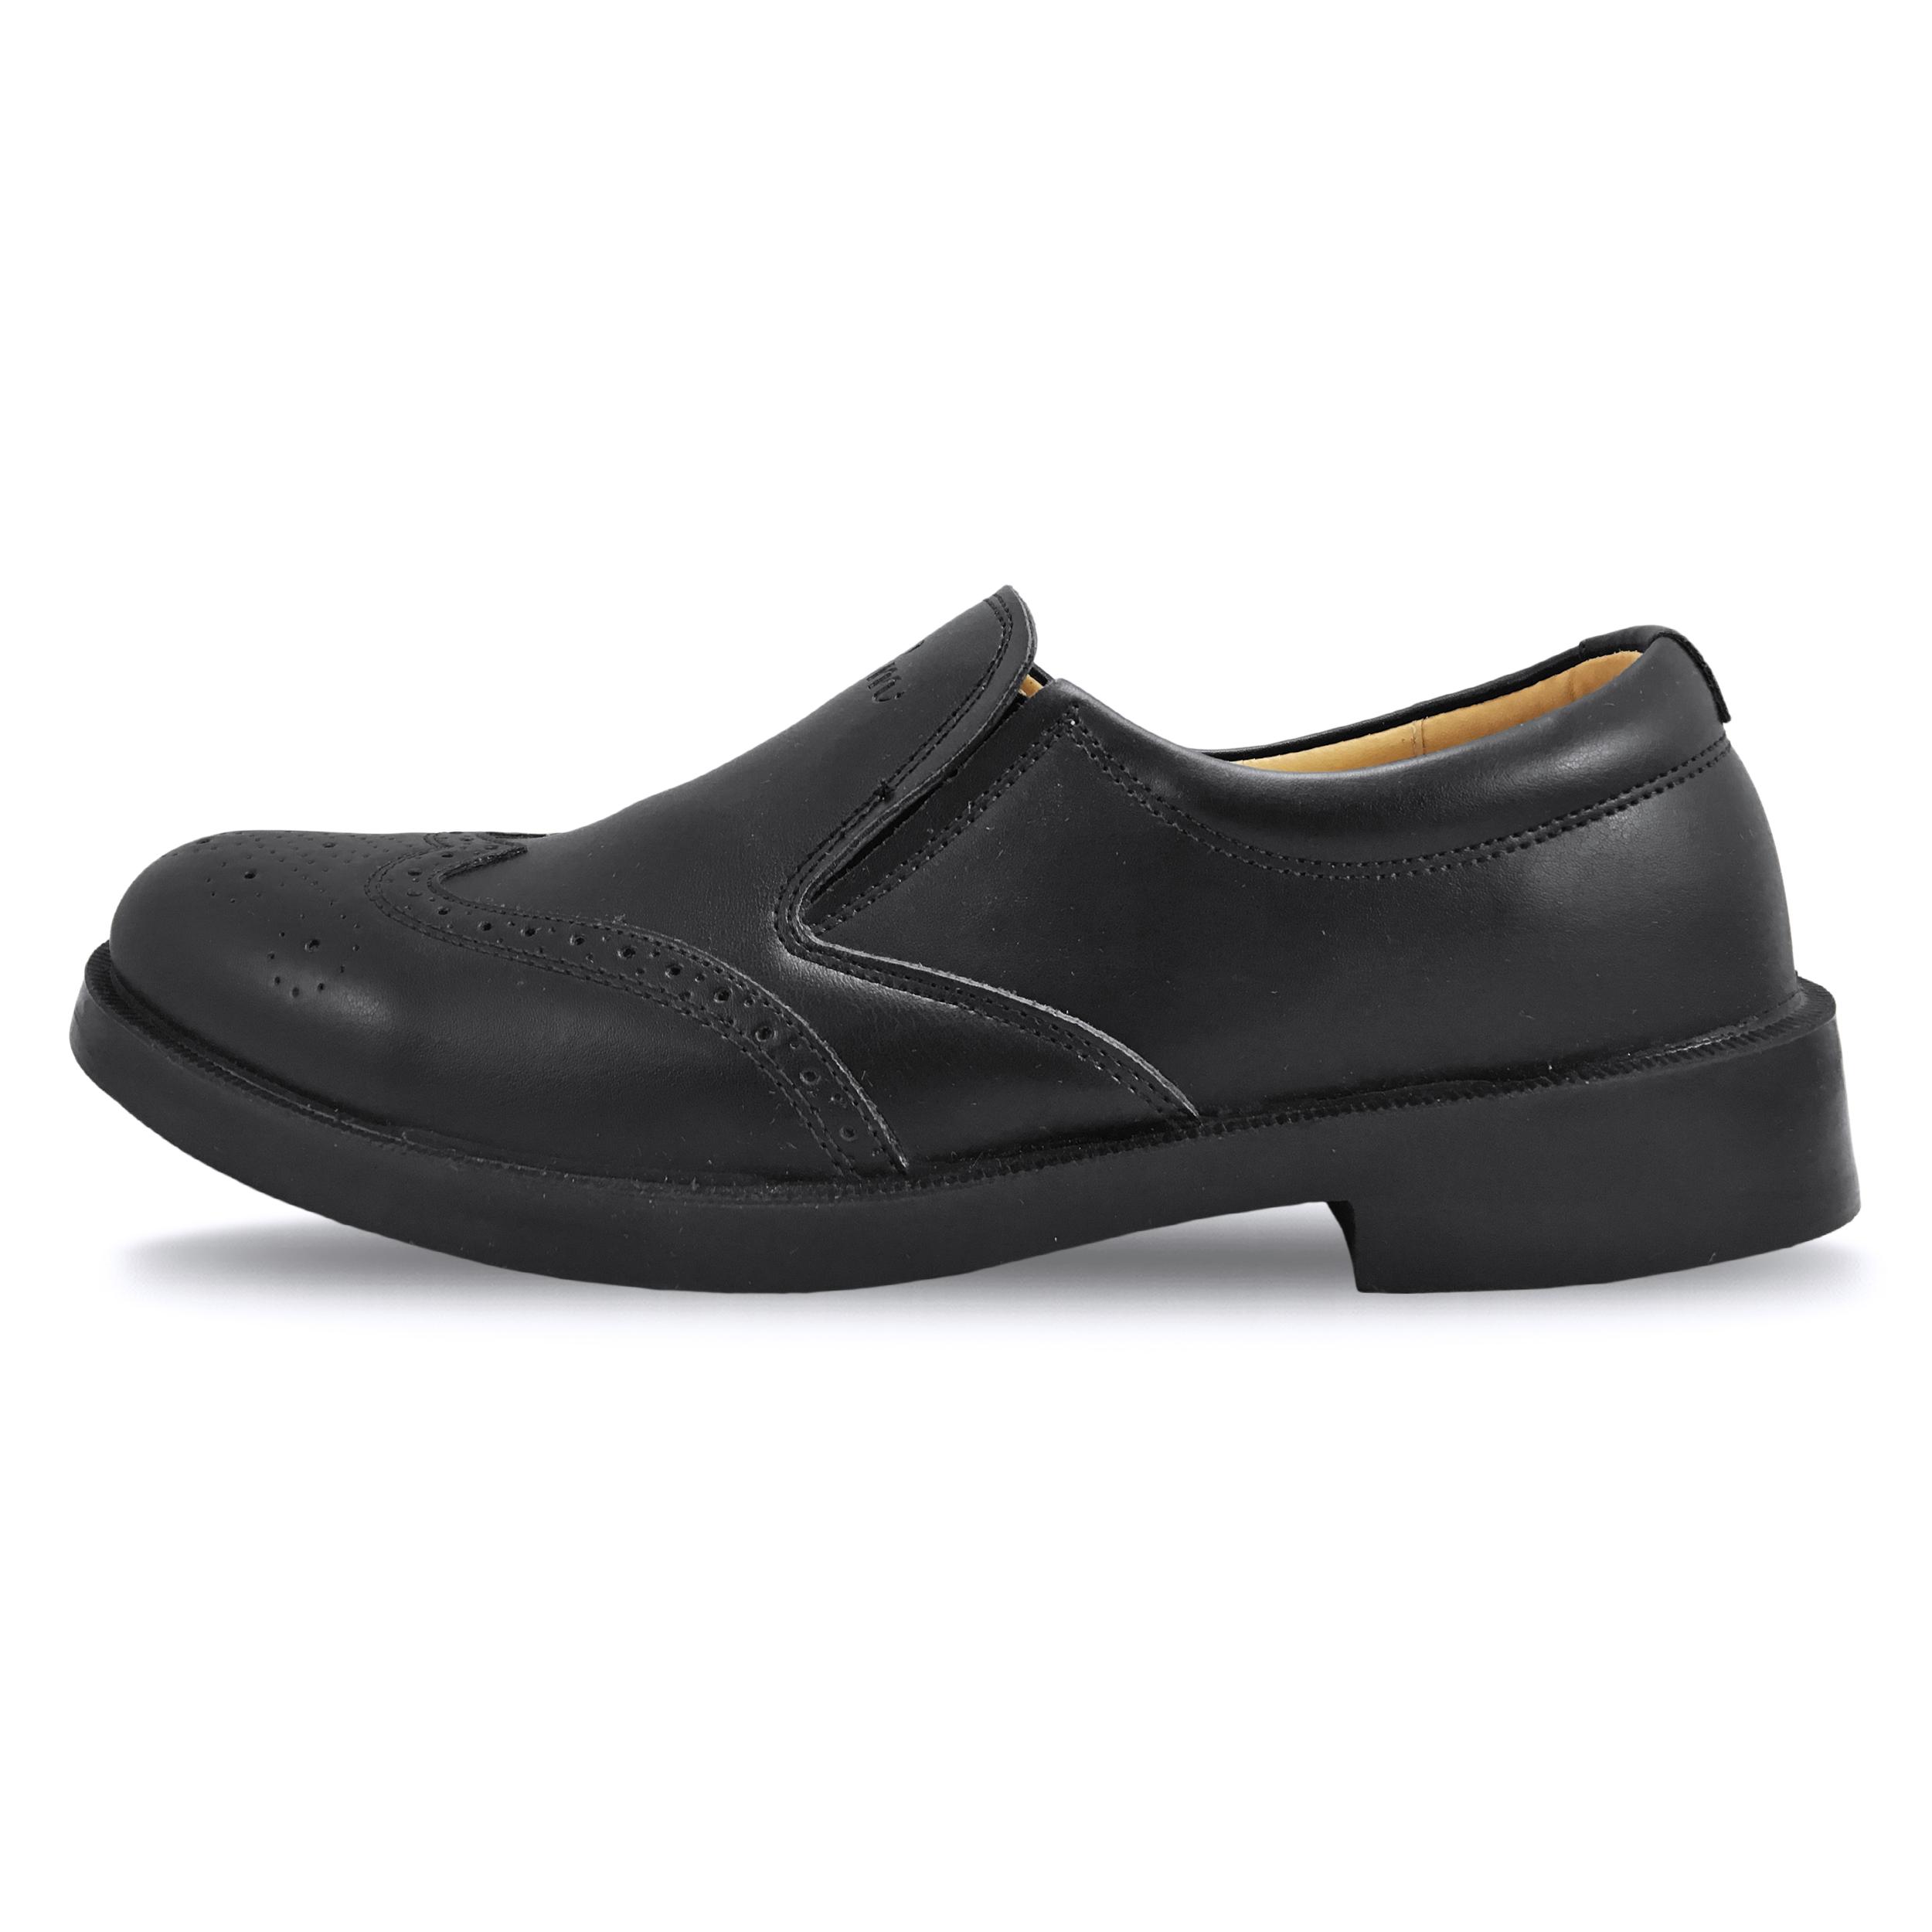 عکس کفش مردانه الهام  کد 3607